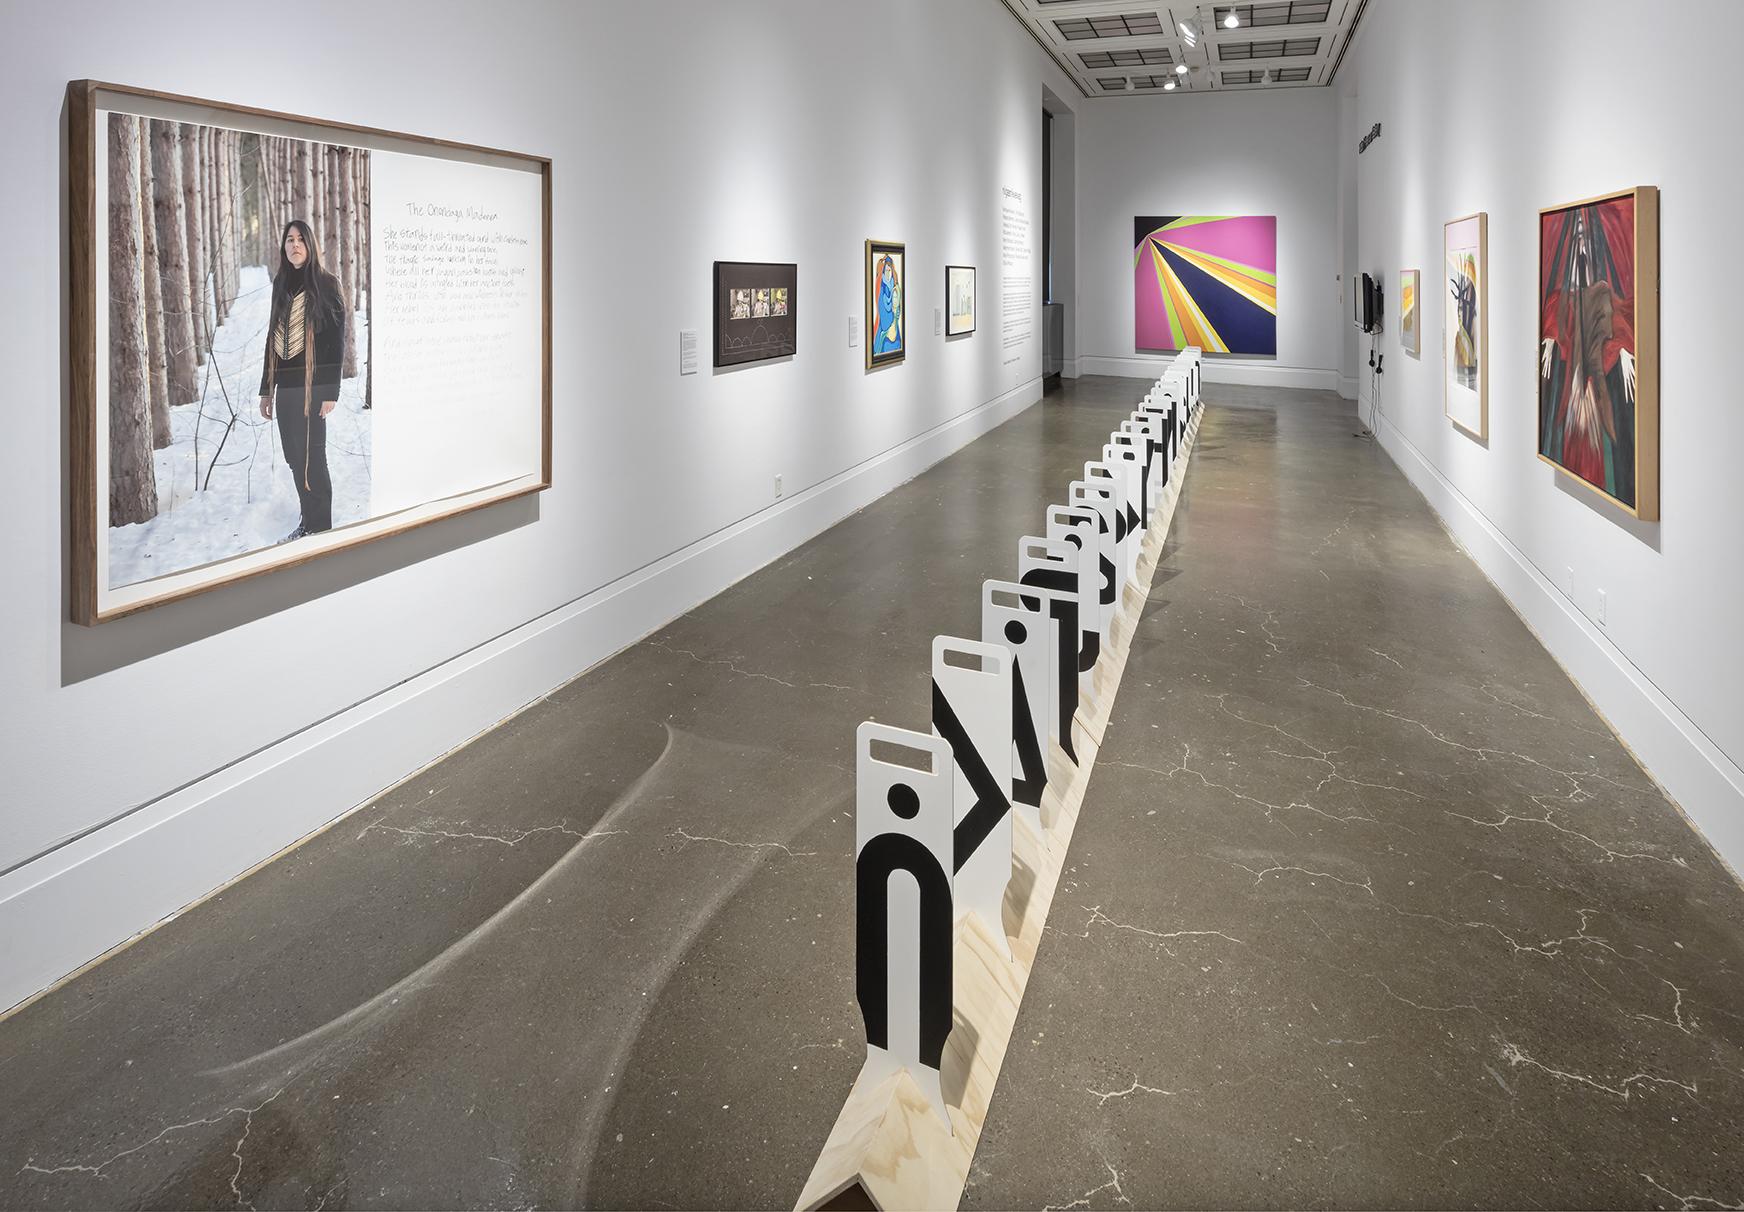 niigaanikwewag , Robert Freeman Gallery, Art Gallery of Mississauga. Photo by Toni Hafkenscheid